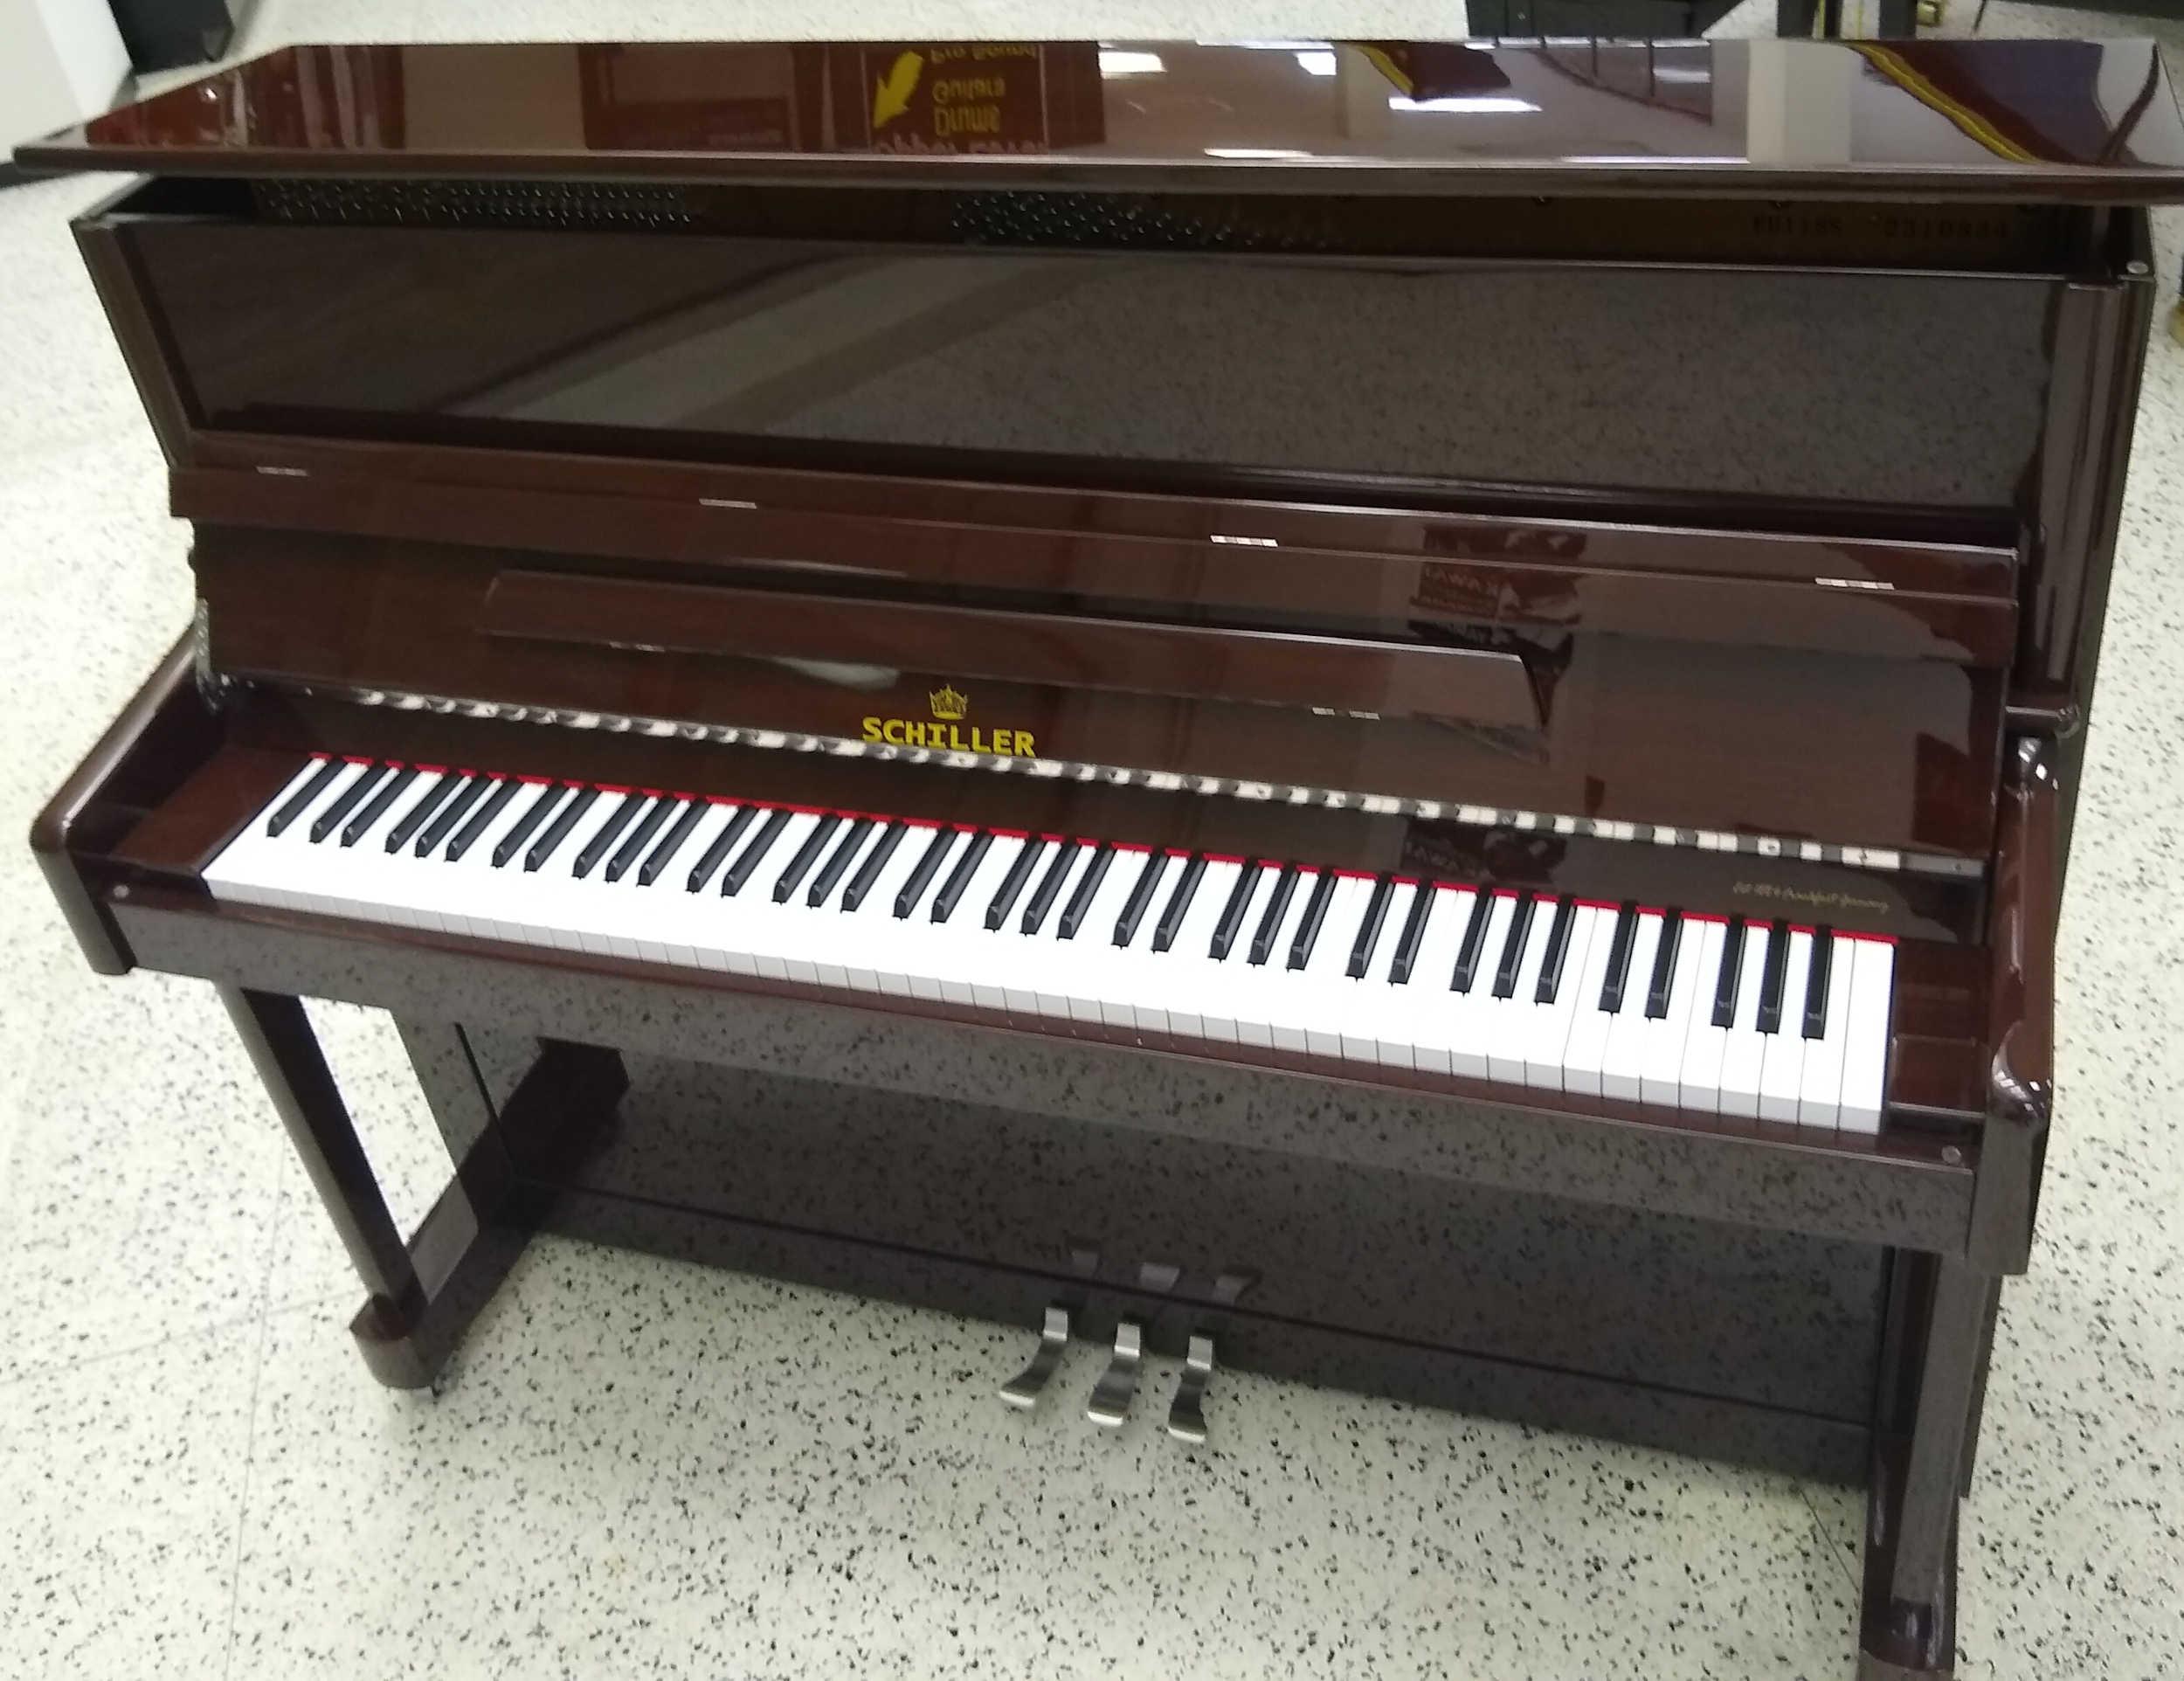 Schiller Berlin Performance Upright Piano Expresso Walnut/Chrome